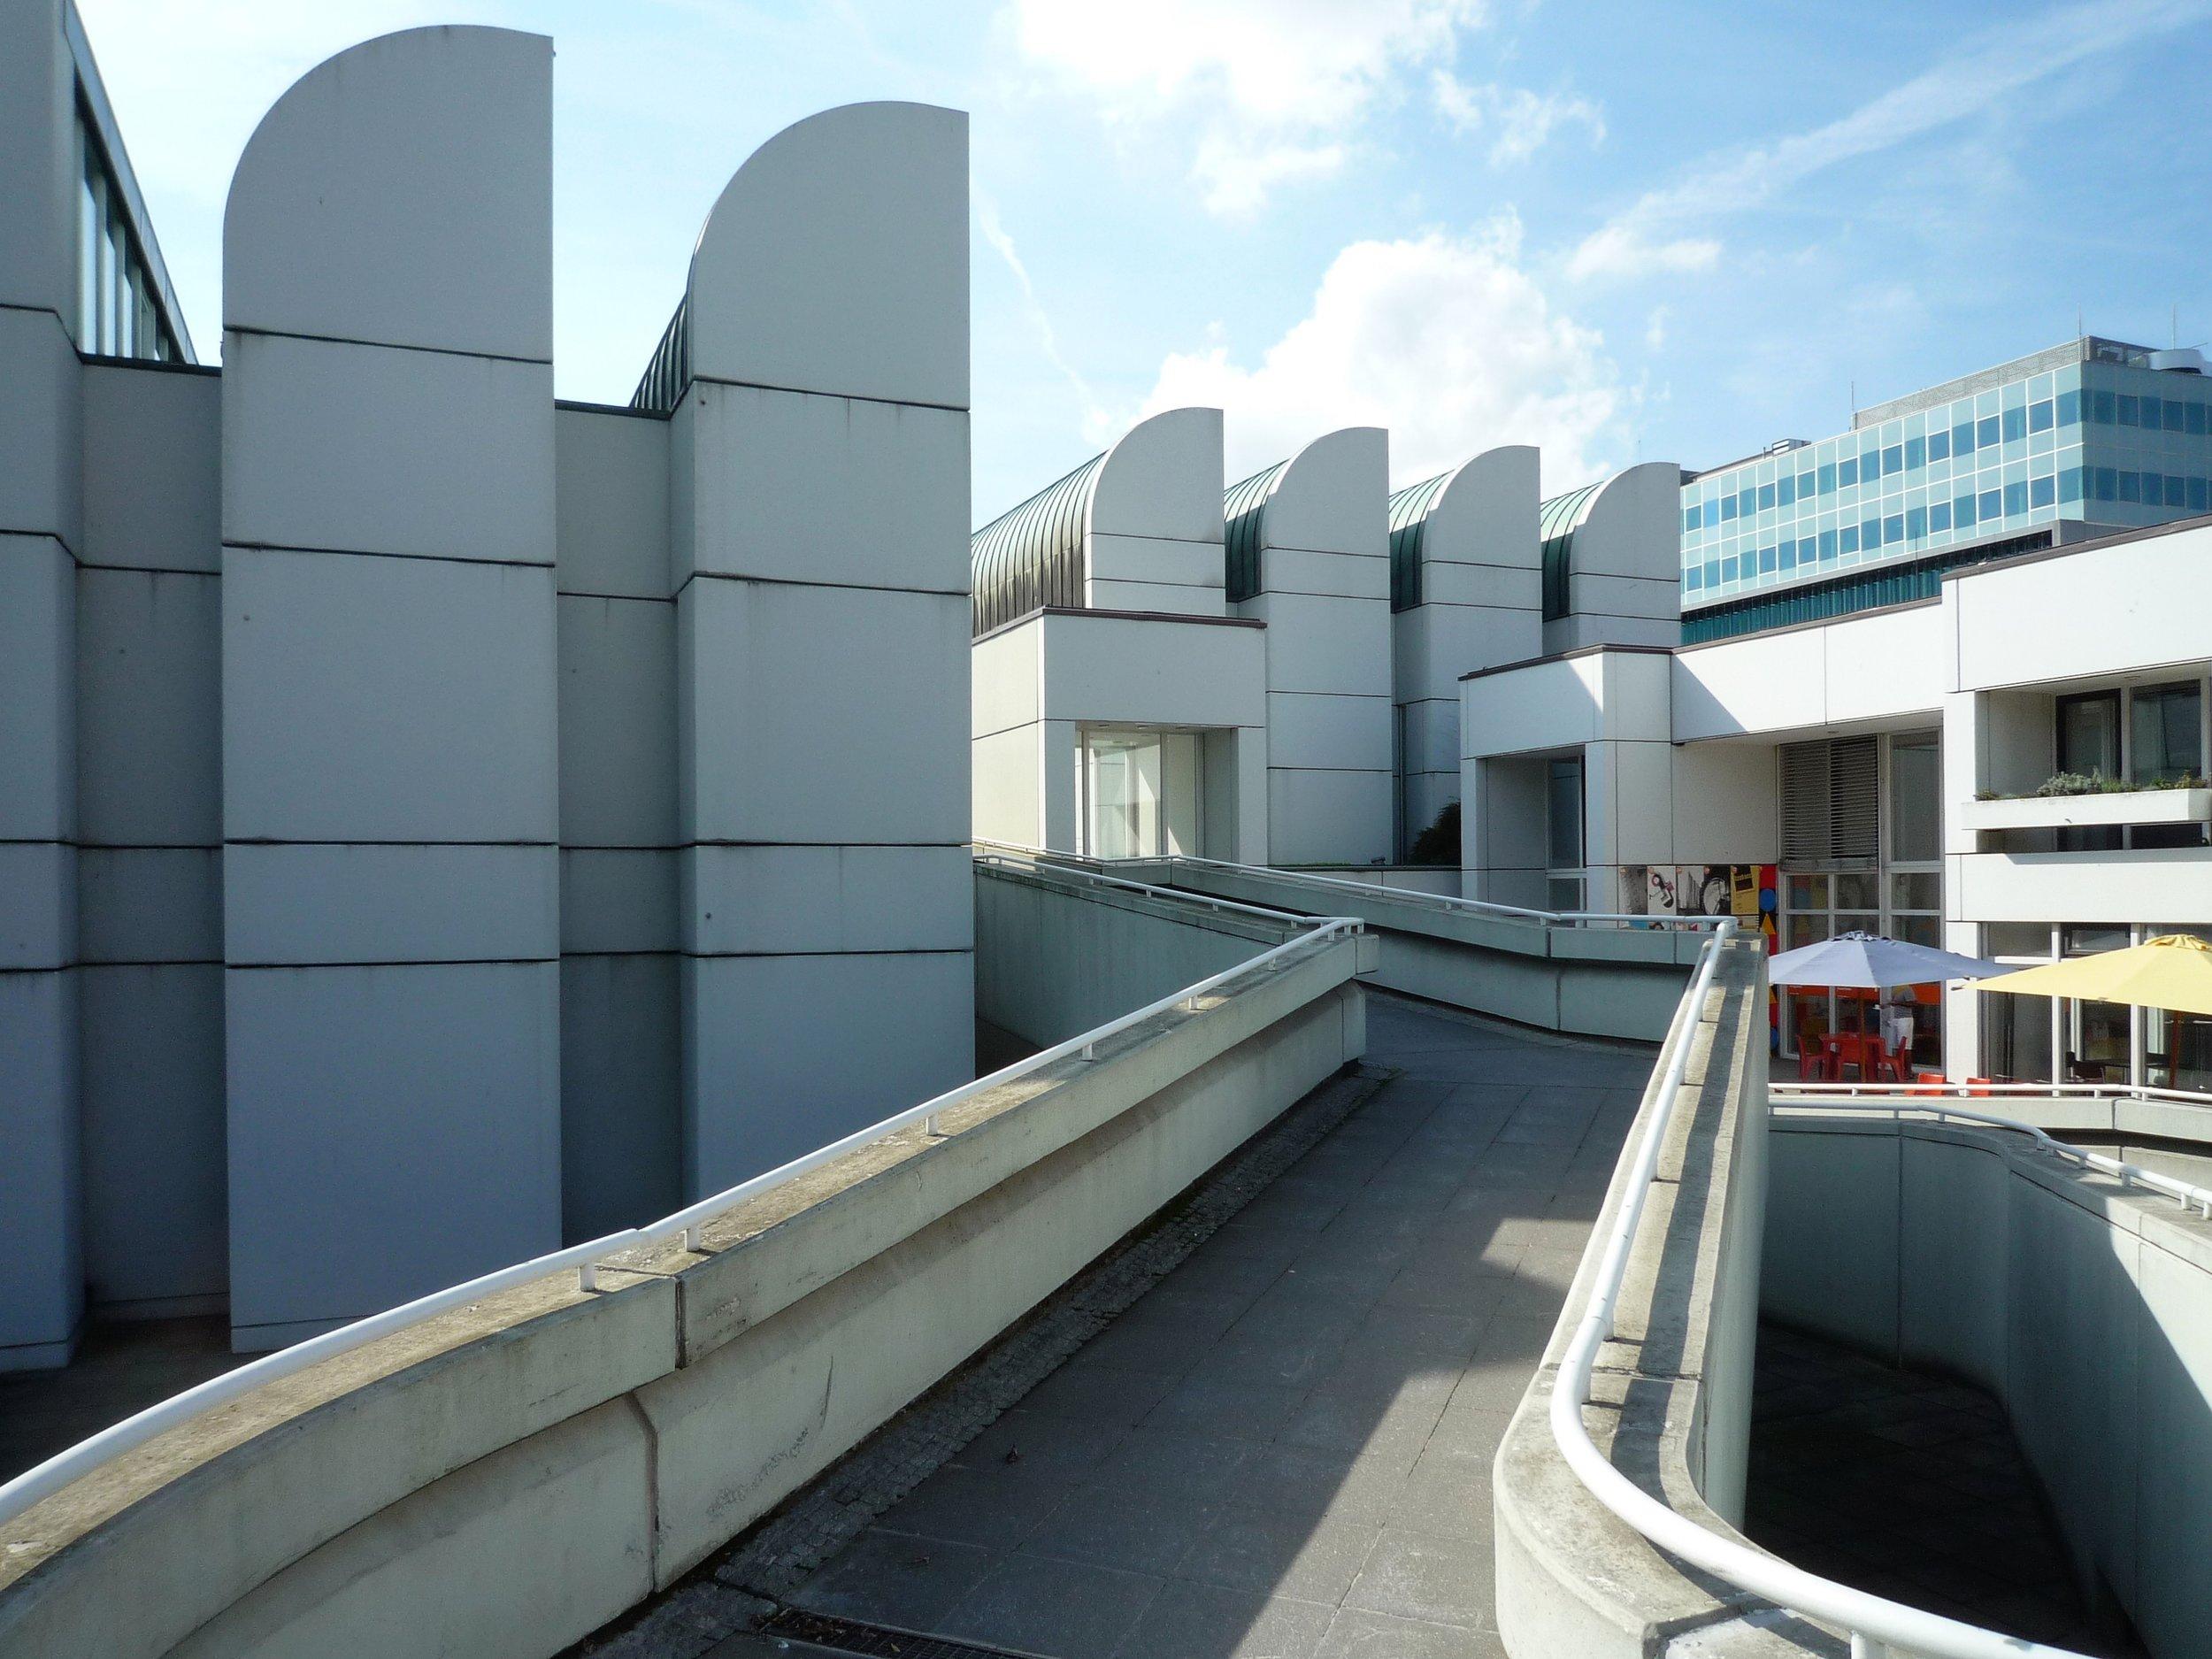 Bauhaus Museum in Berlin